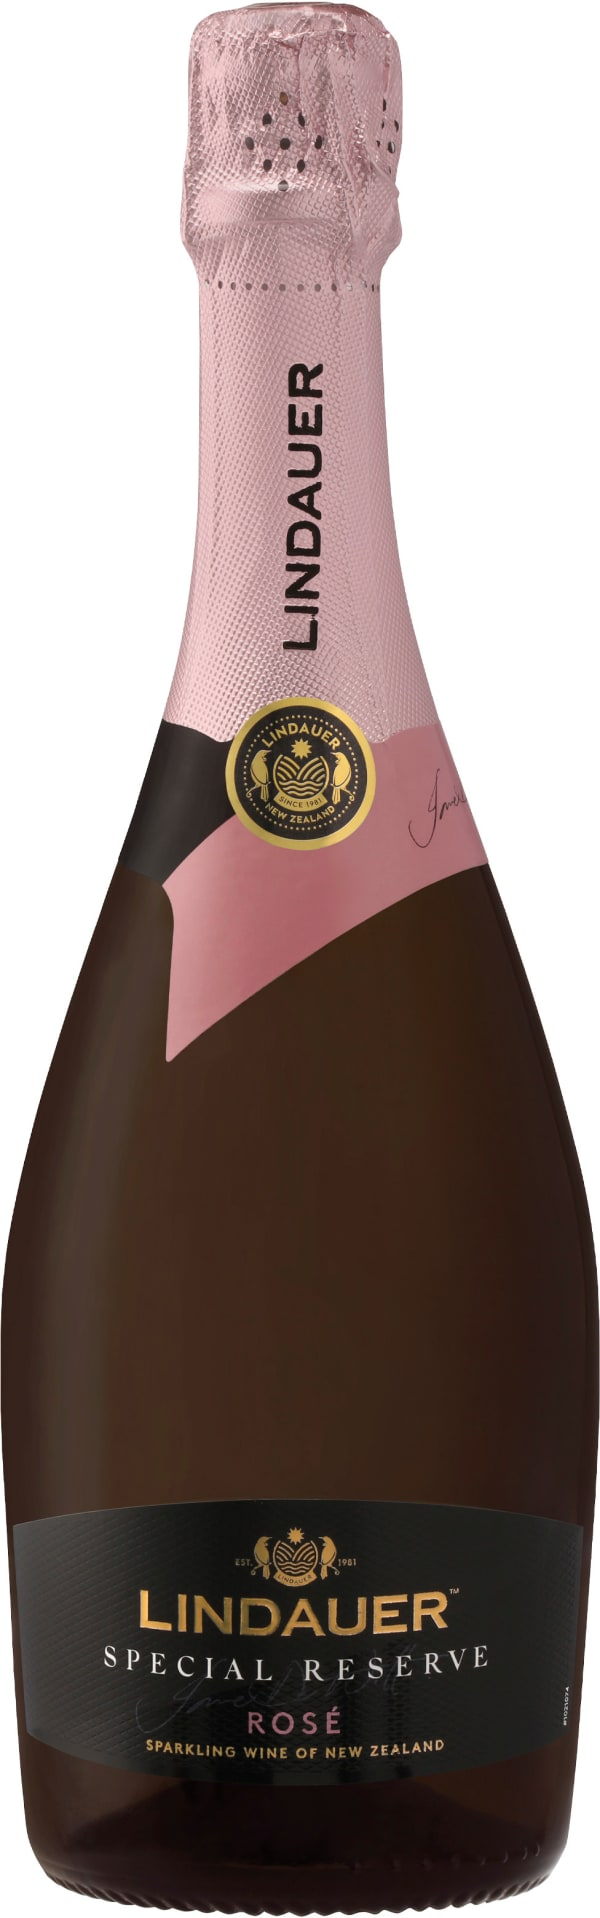 Lindauer Special Reserve Rose Brut